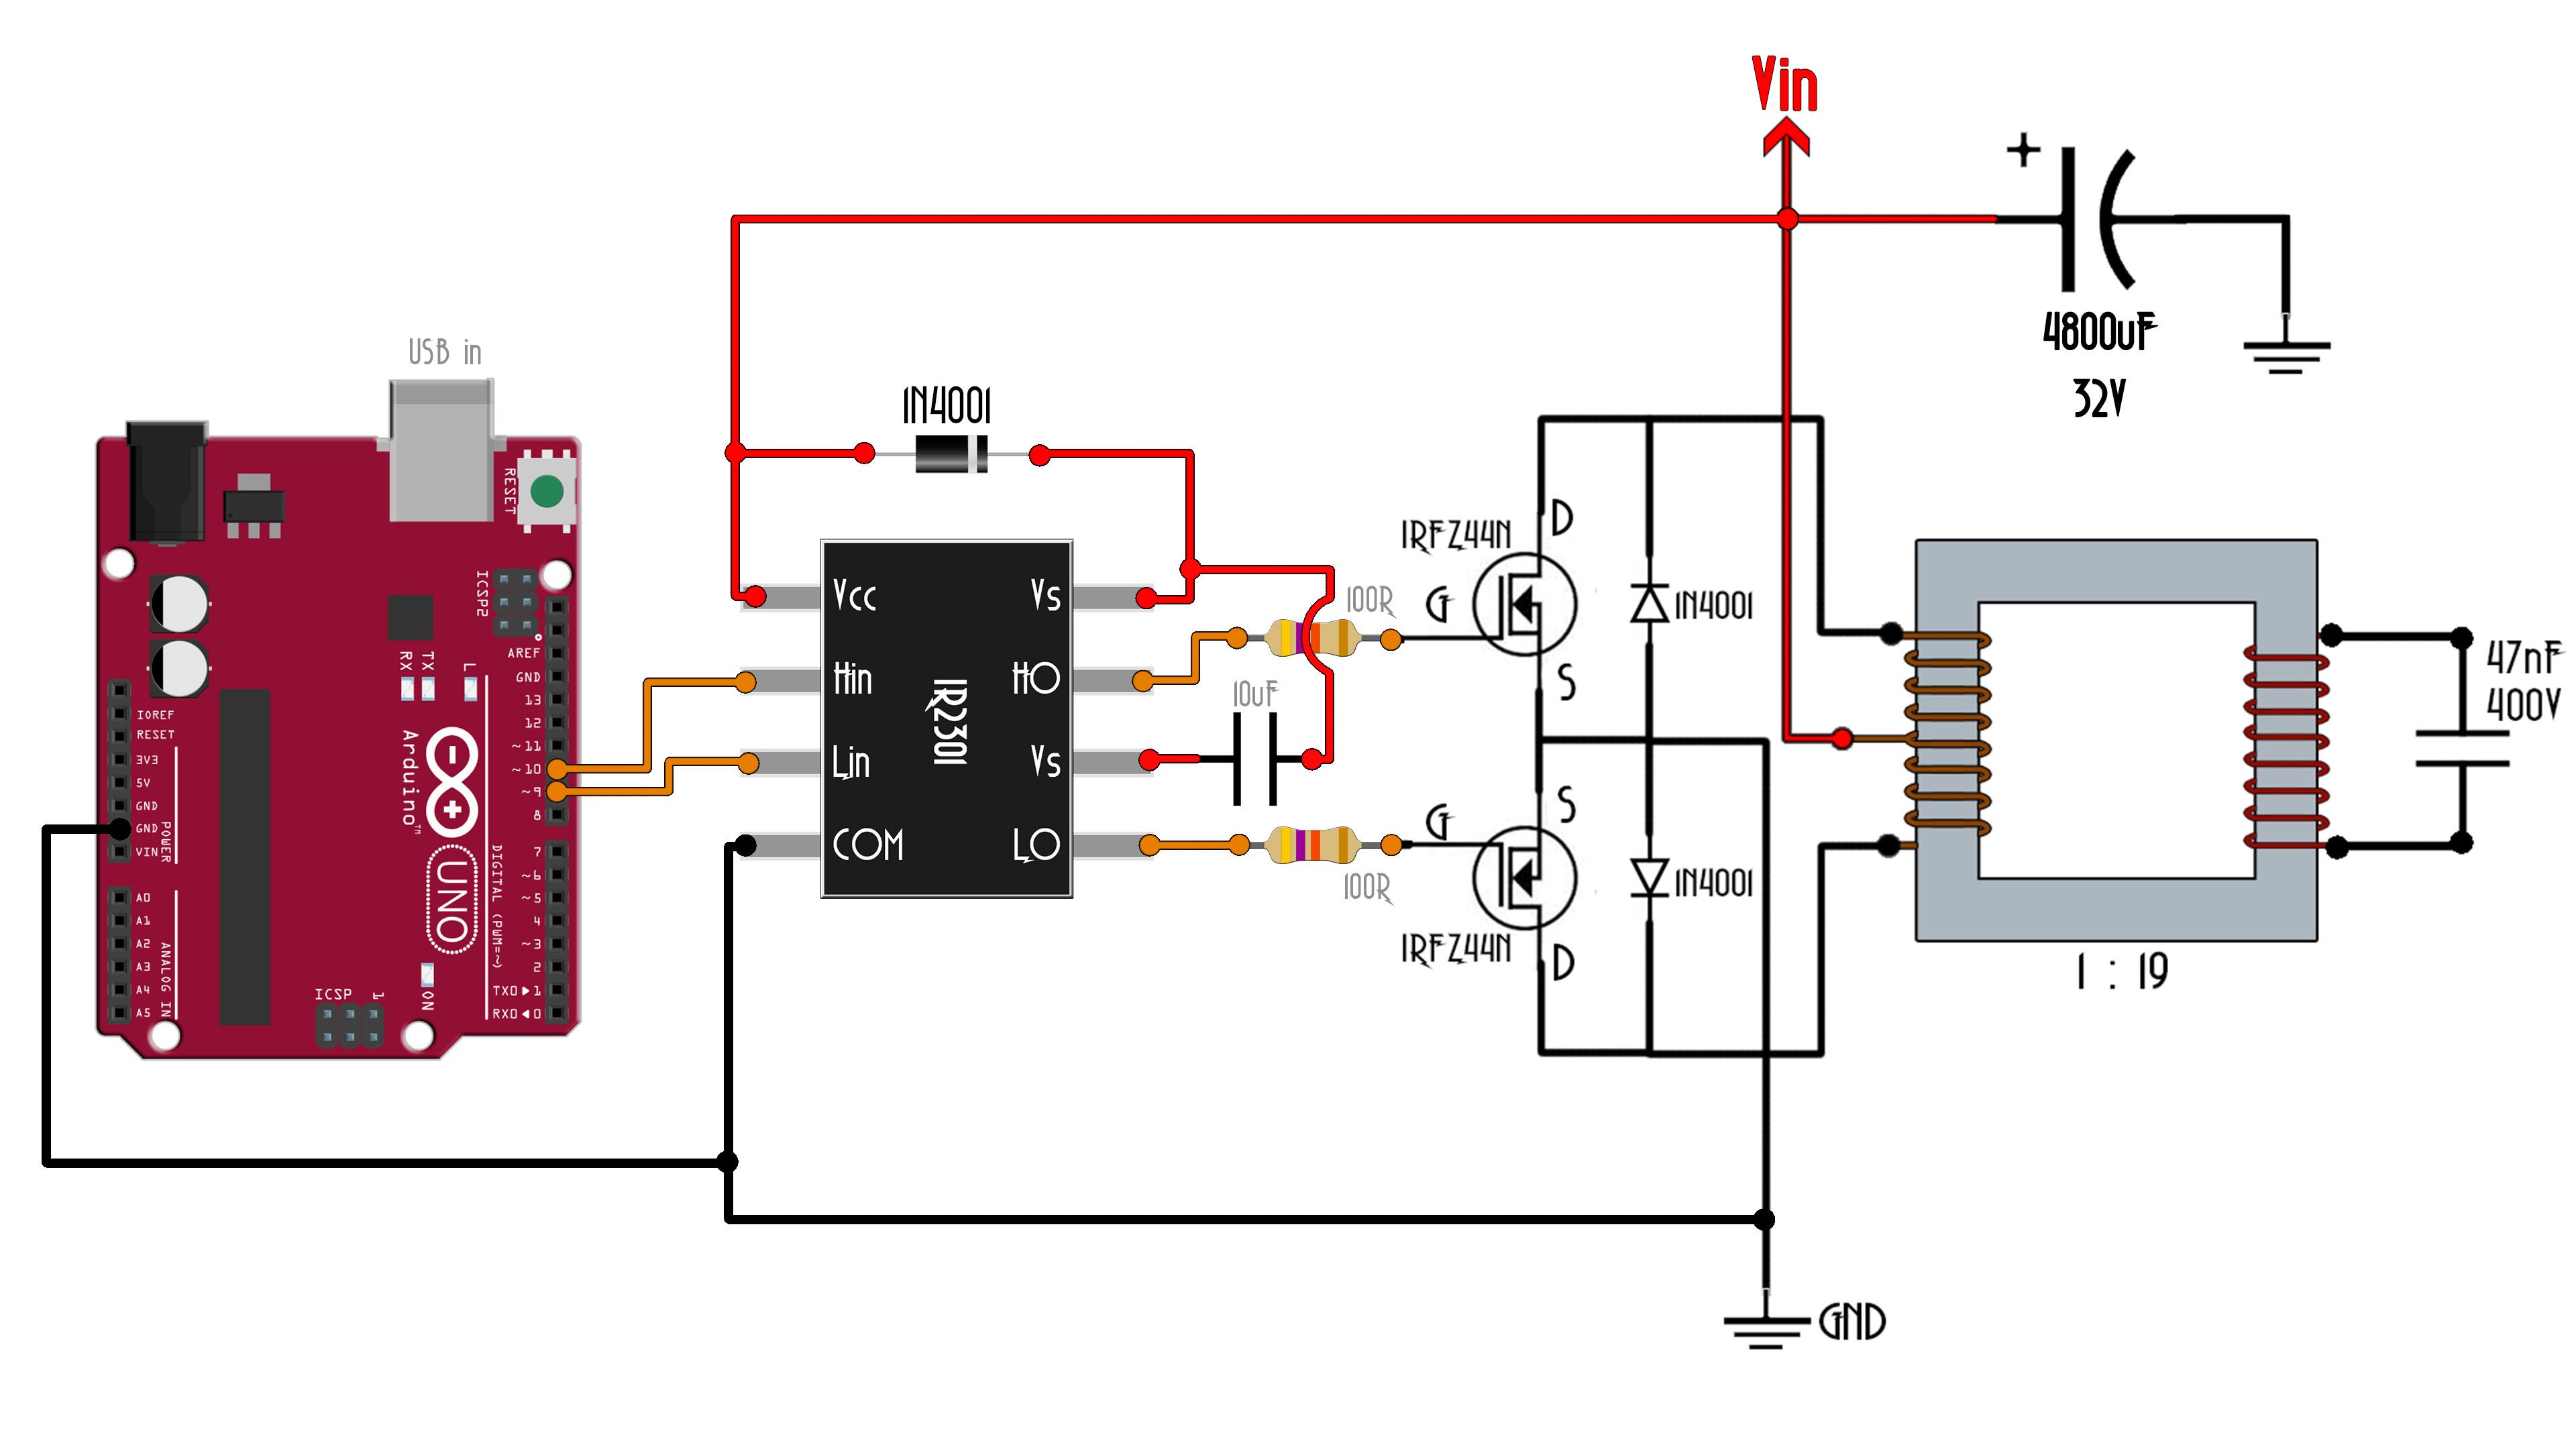 Circuit Diagram Of A Sine Wave Oscillator Is Shown Below